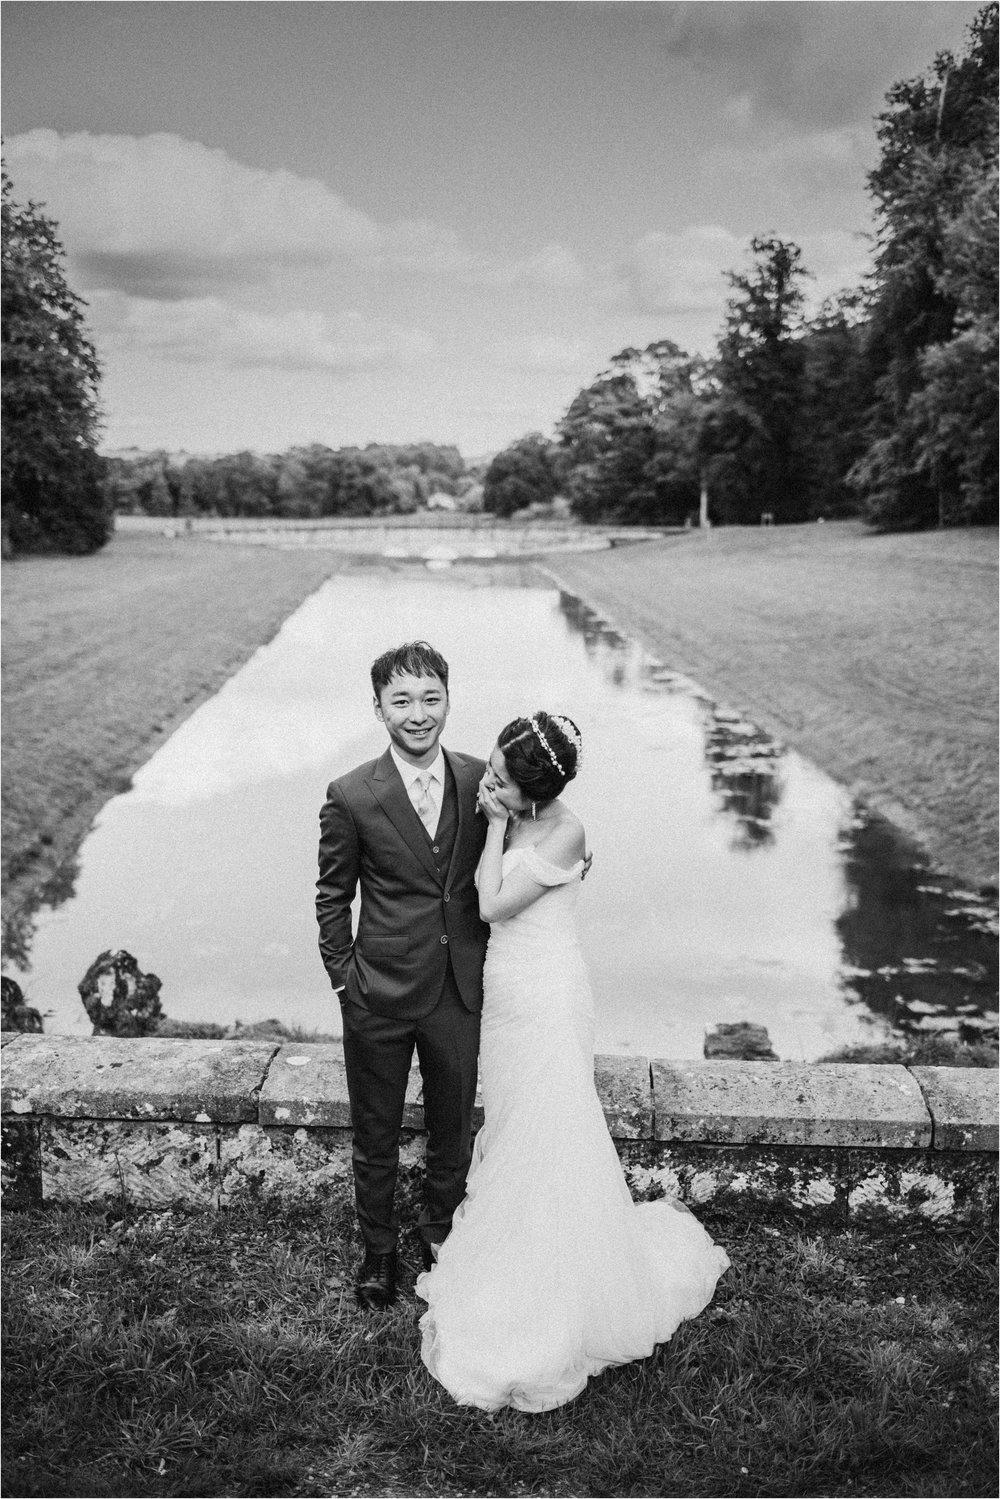 York city elopement wedding photographer_0195.jpg